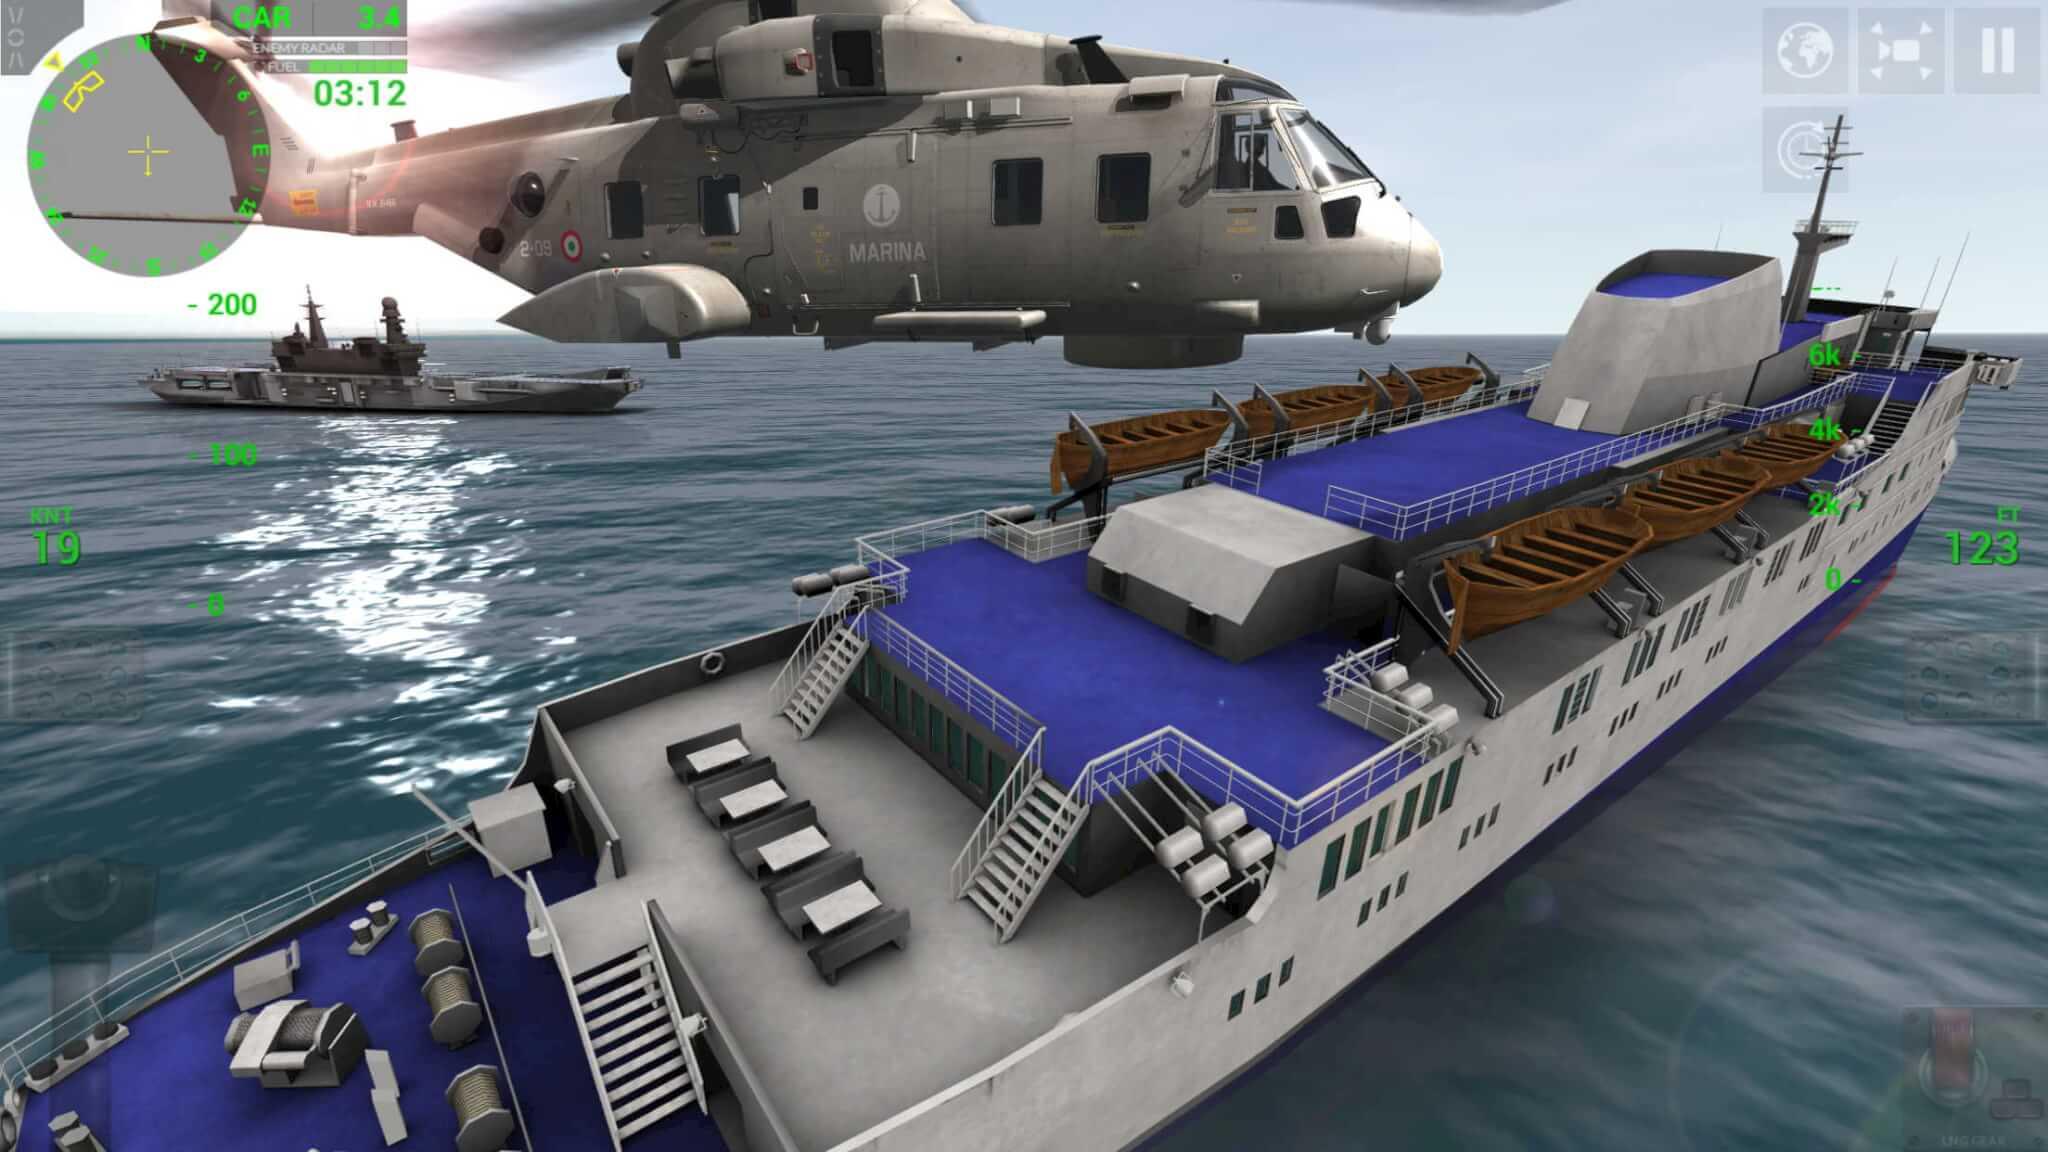 Marina Militare (Bildrechte bei Rortos)